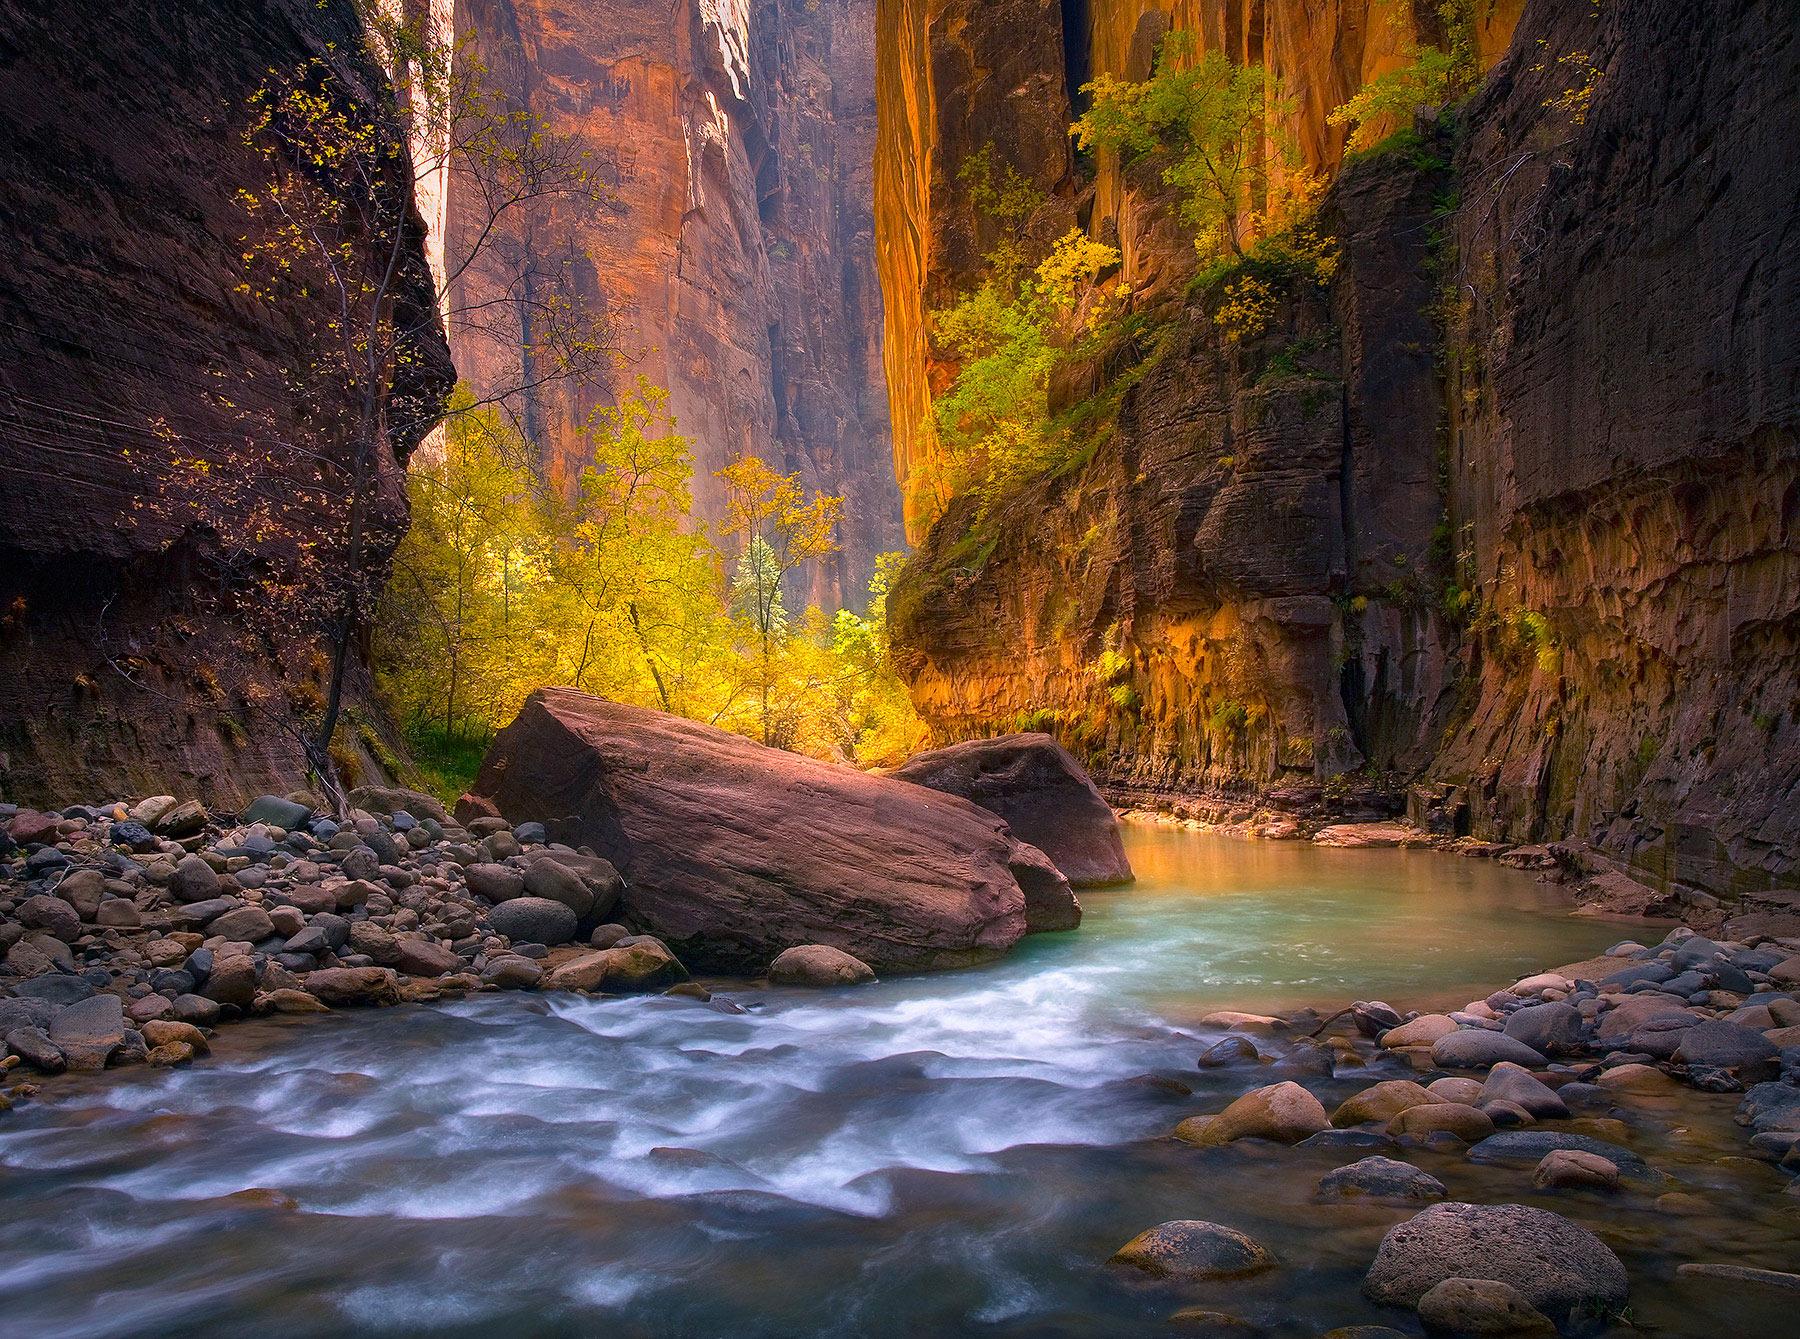 Full Hd Wallpaper For Laptop Amazing Paradise 2006 Virgin River Canyon Utah Marc